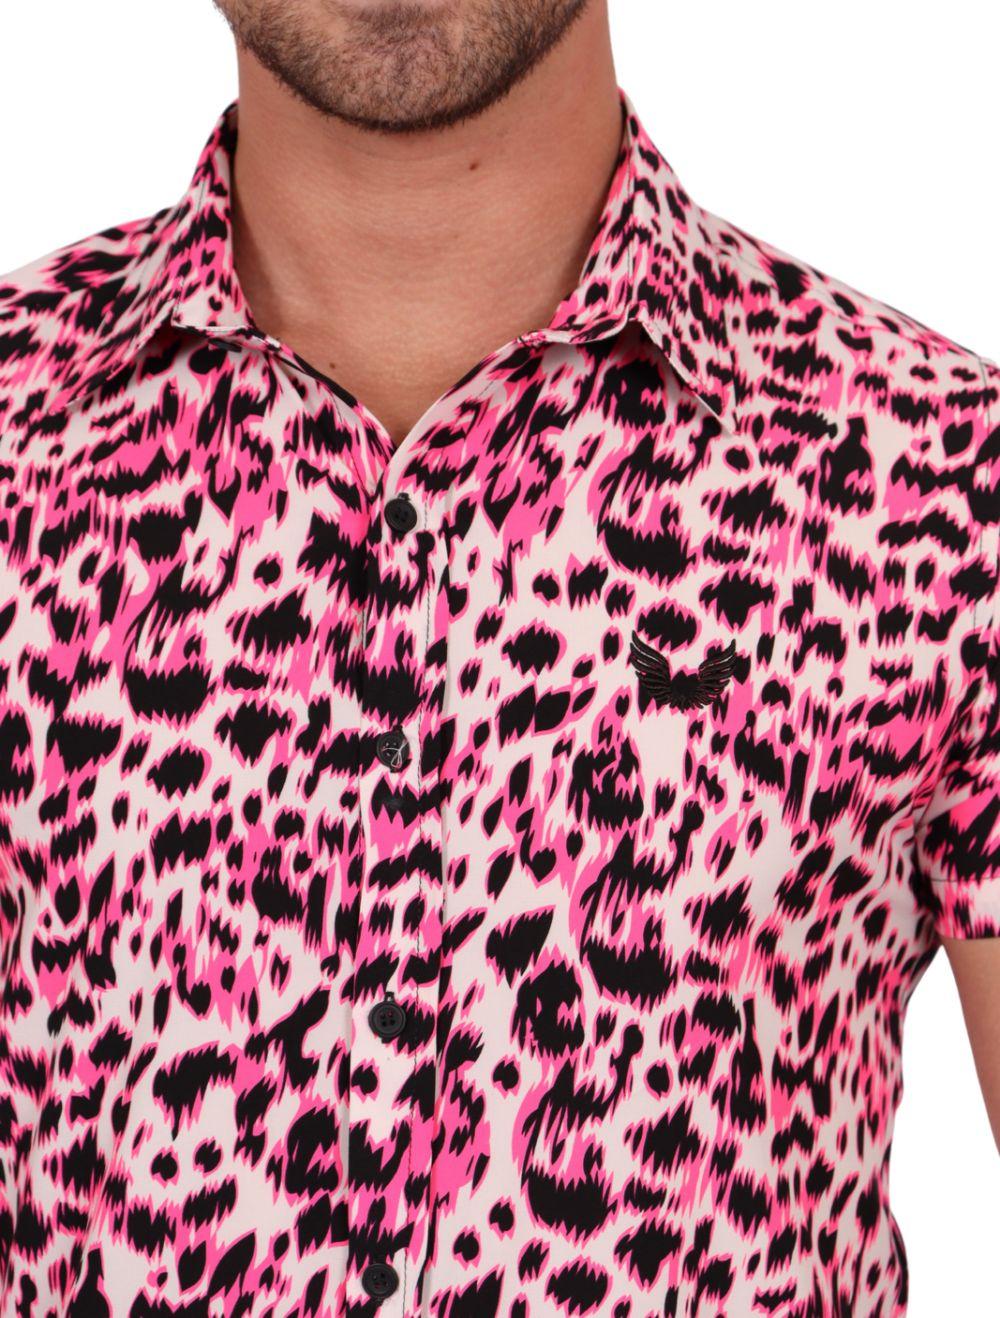 Camisa Masculina Manga Curta Rosa Estampada